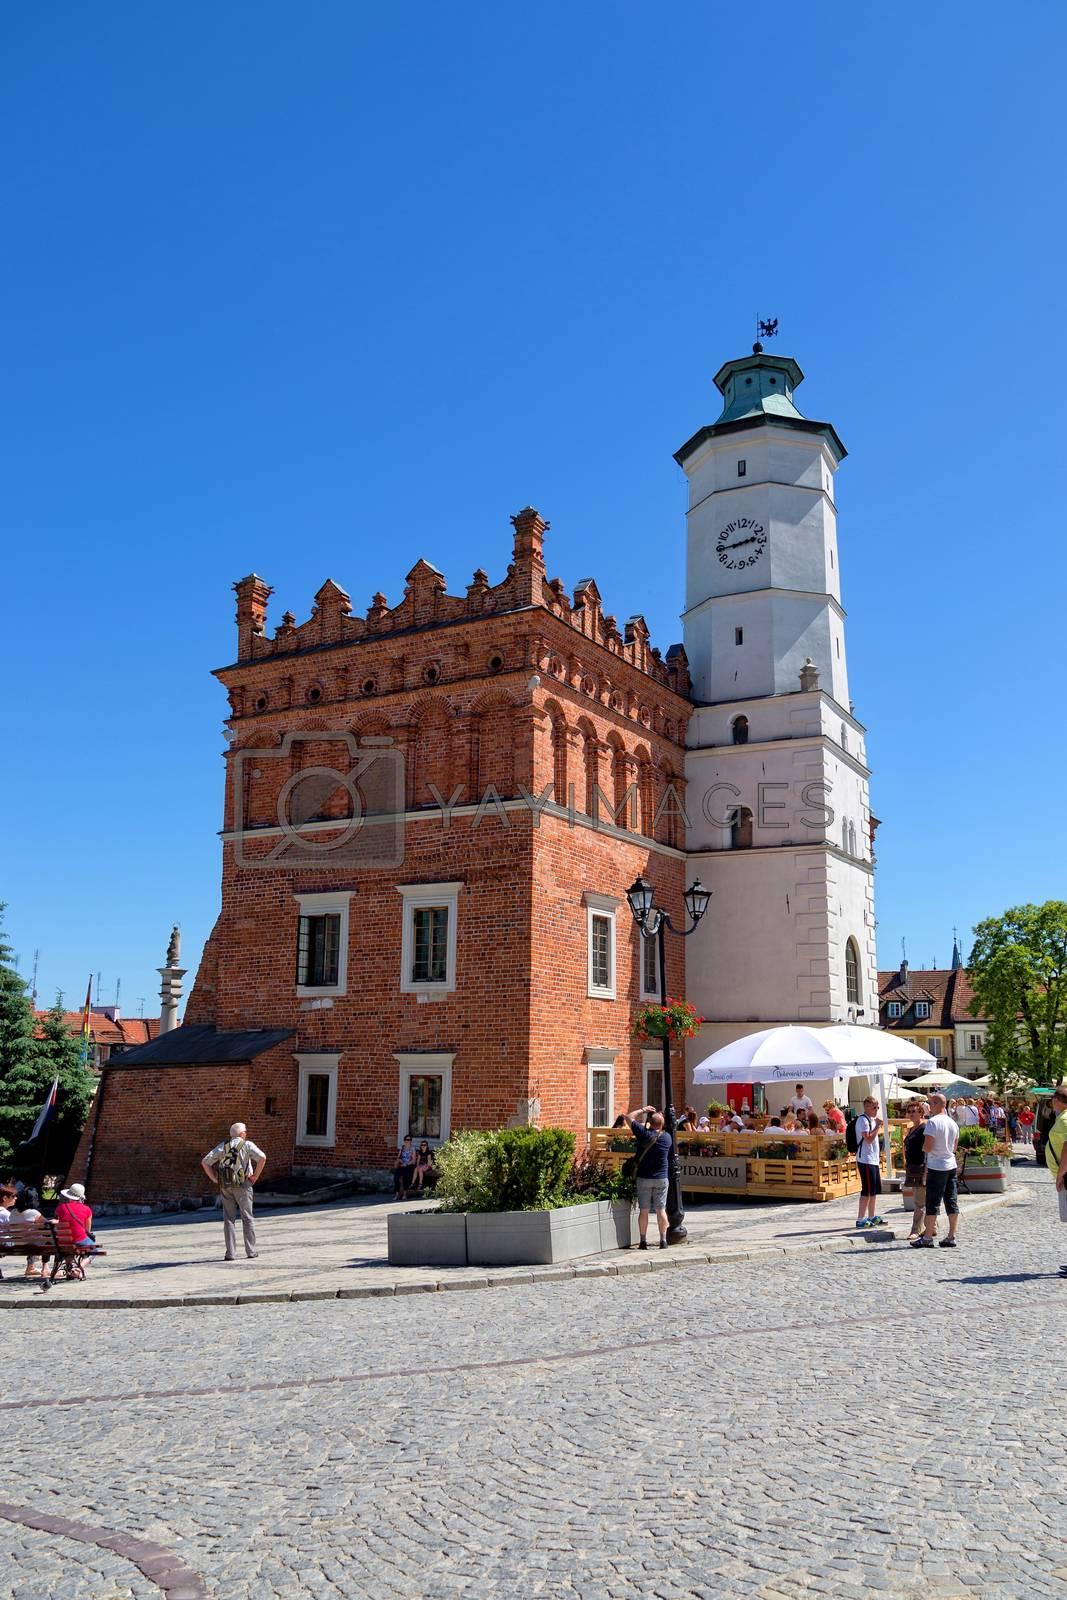 SANDOMIERZ - JUNE 05: City Hall in the Old Town on June 05, 2015 in Sandomierz, Poland